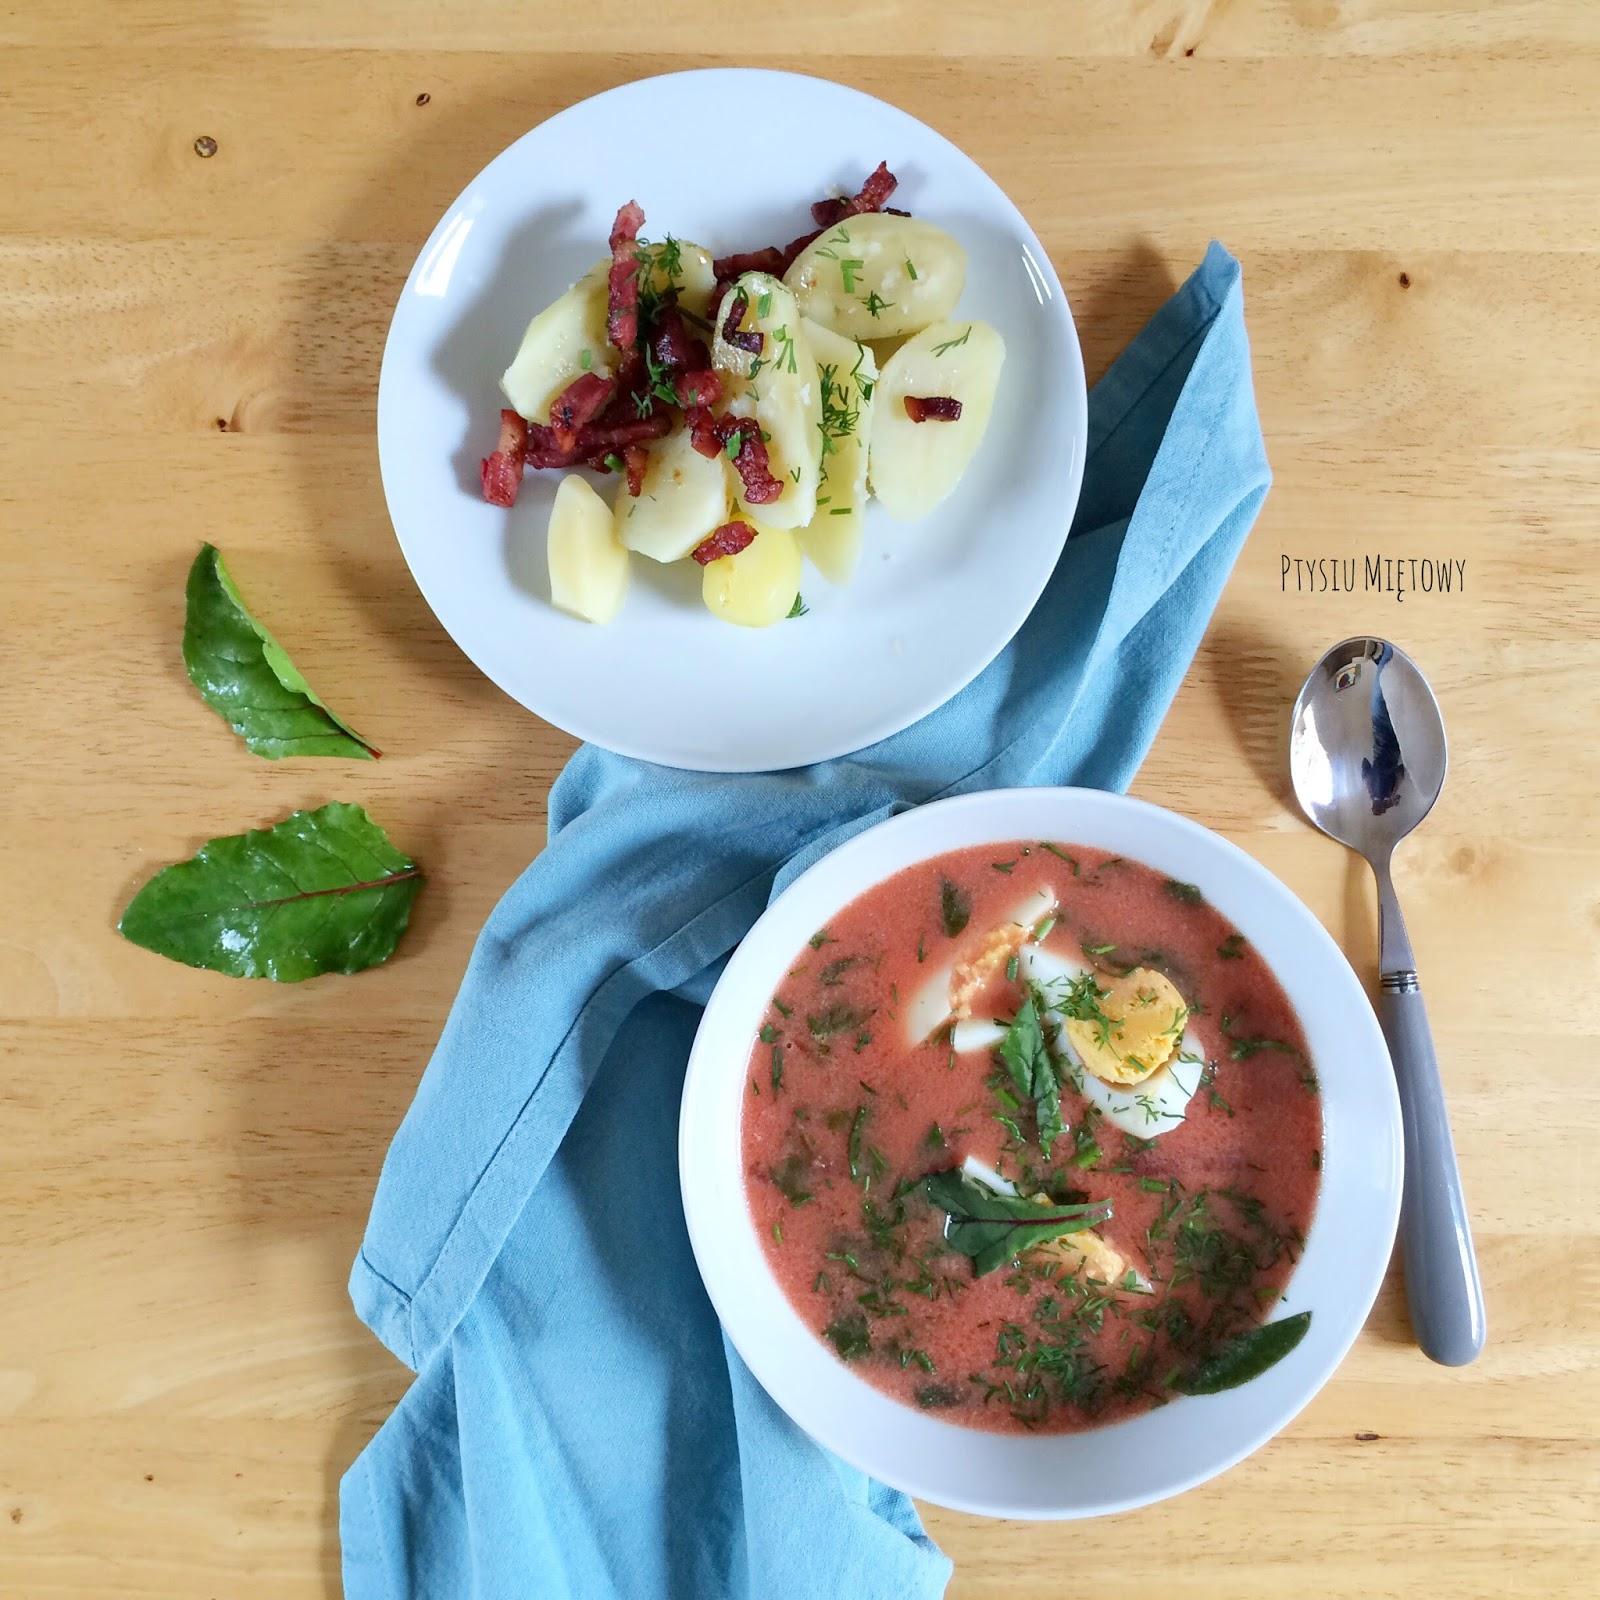 zupa, mlode buraki, ptysiu mietowy